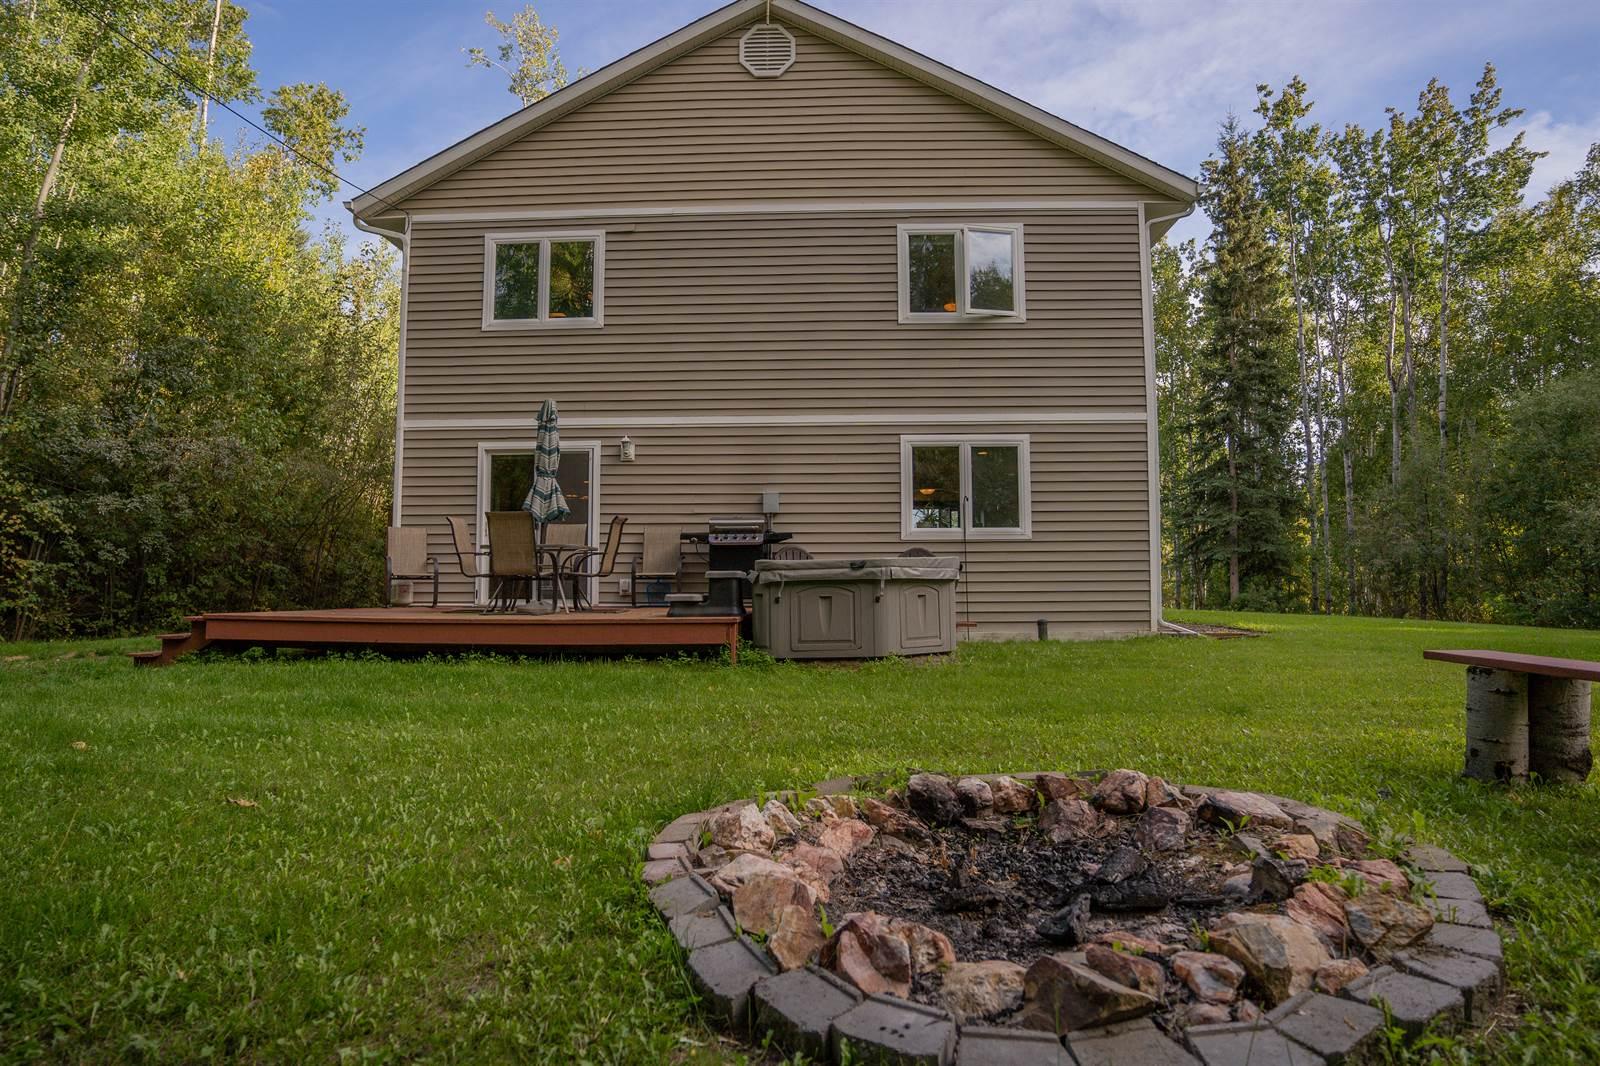 3180 Moominvalley, Fairbanks, AK 99709